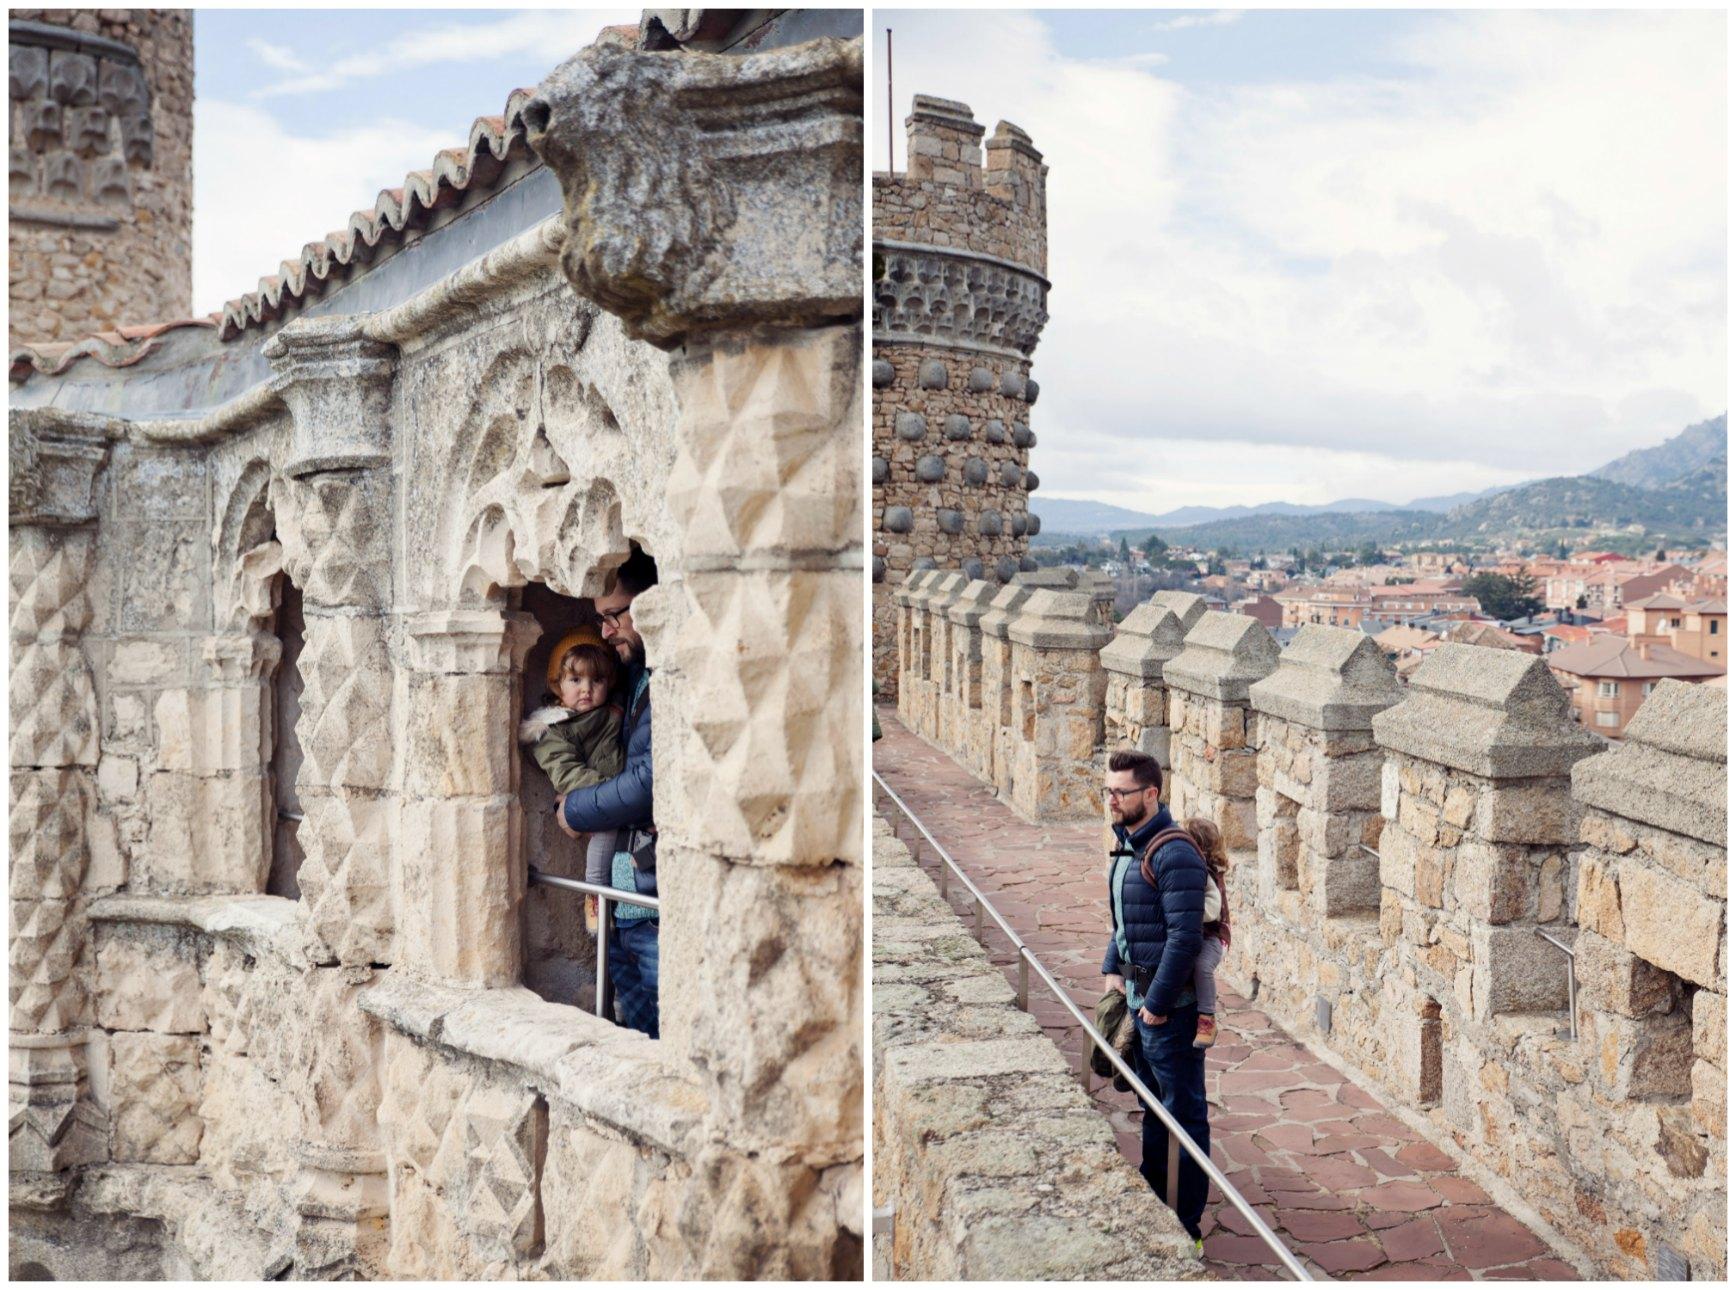 Castillo-Manzanares-El-Real-claraBmartin-12